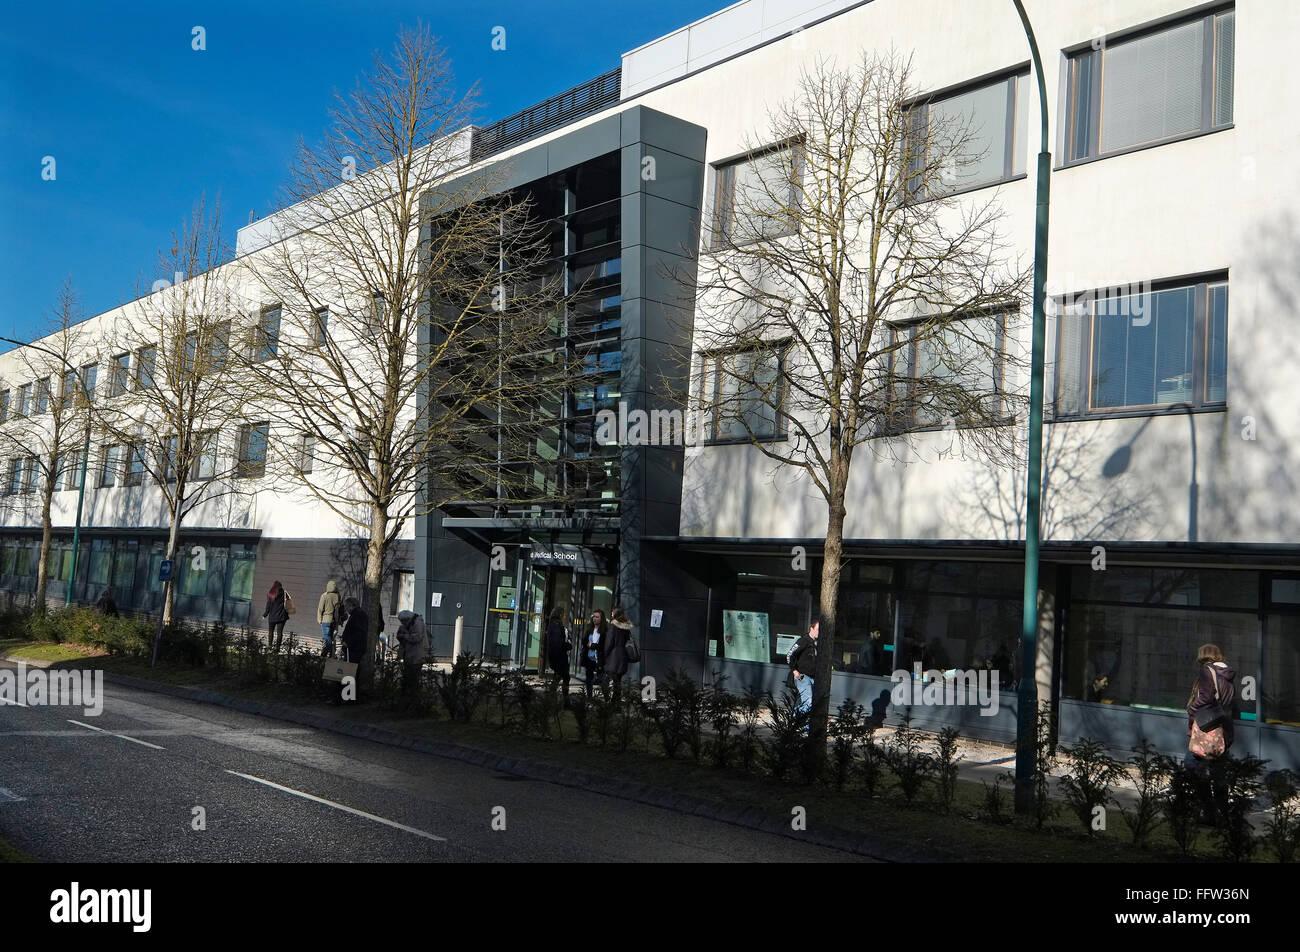 norwich medical school, uea, norfolk, england - Stock Image